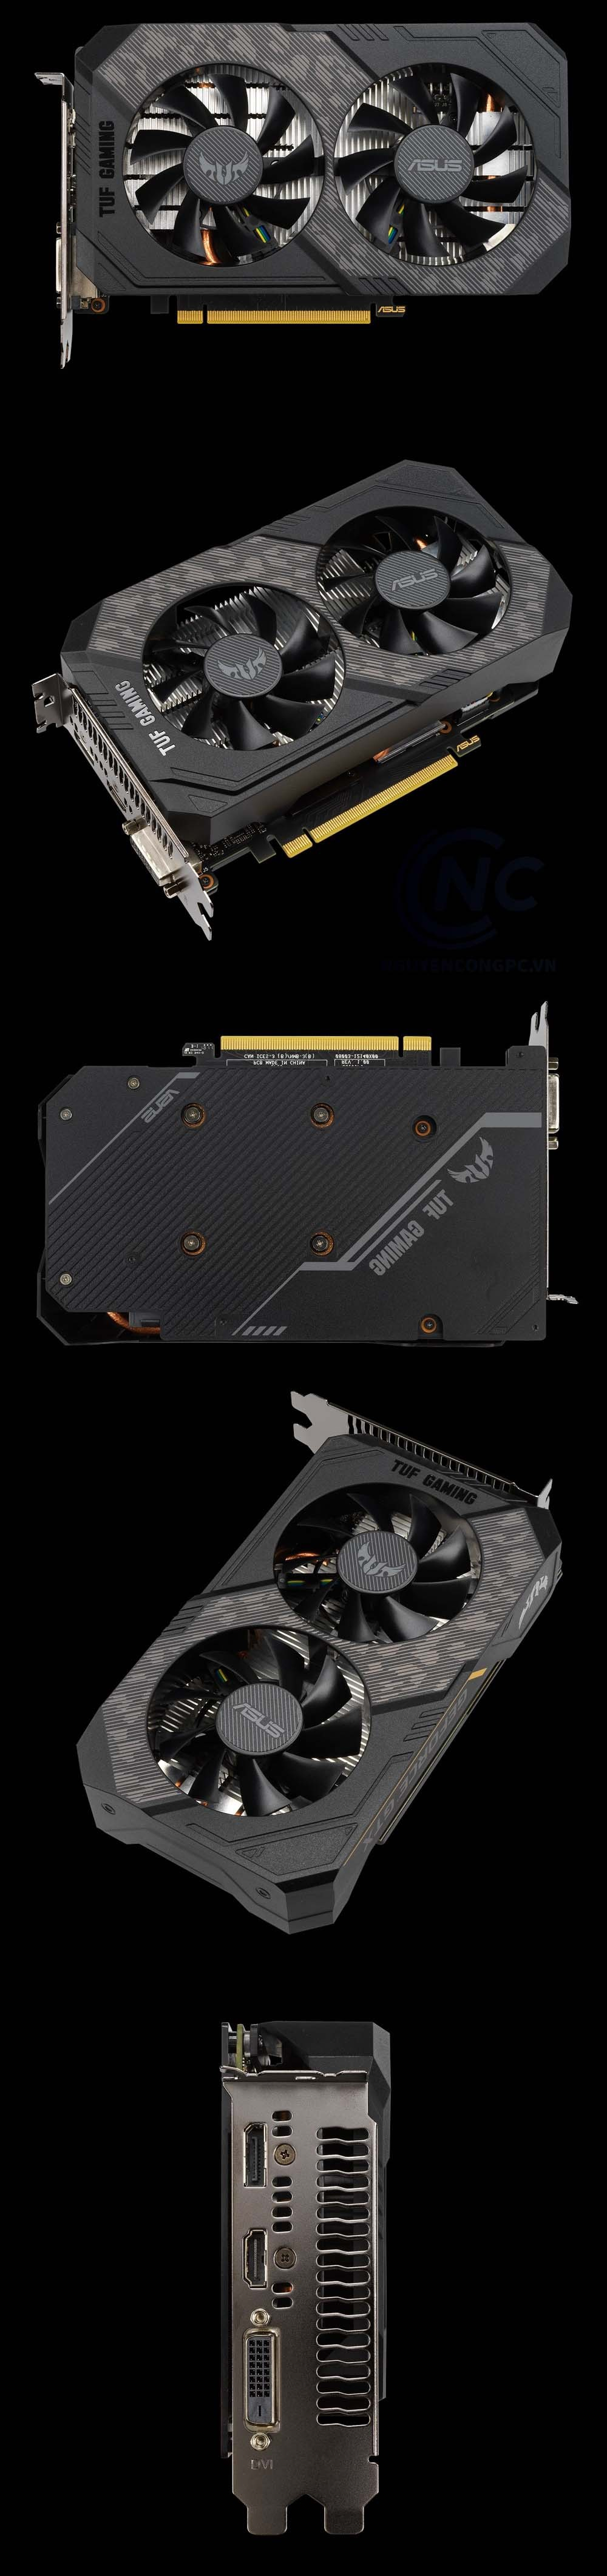 TUF Gaming GTX 1650 Super 4G GDDR6